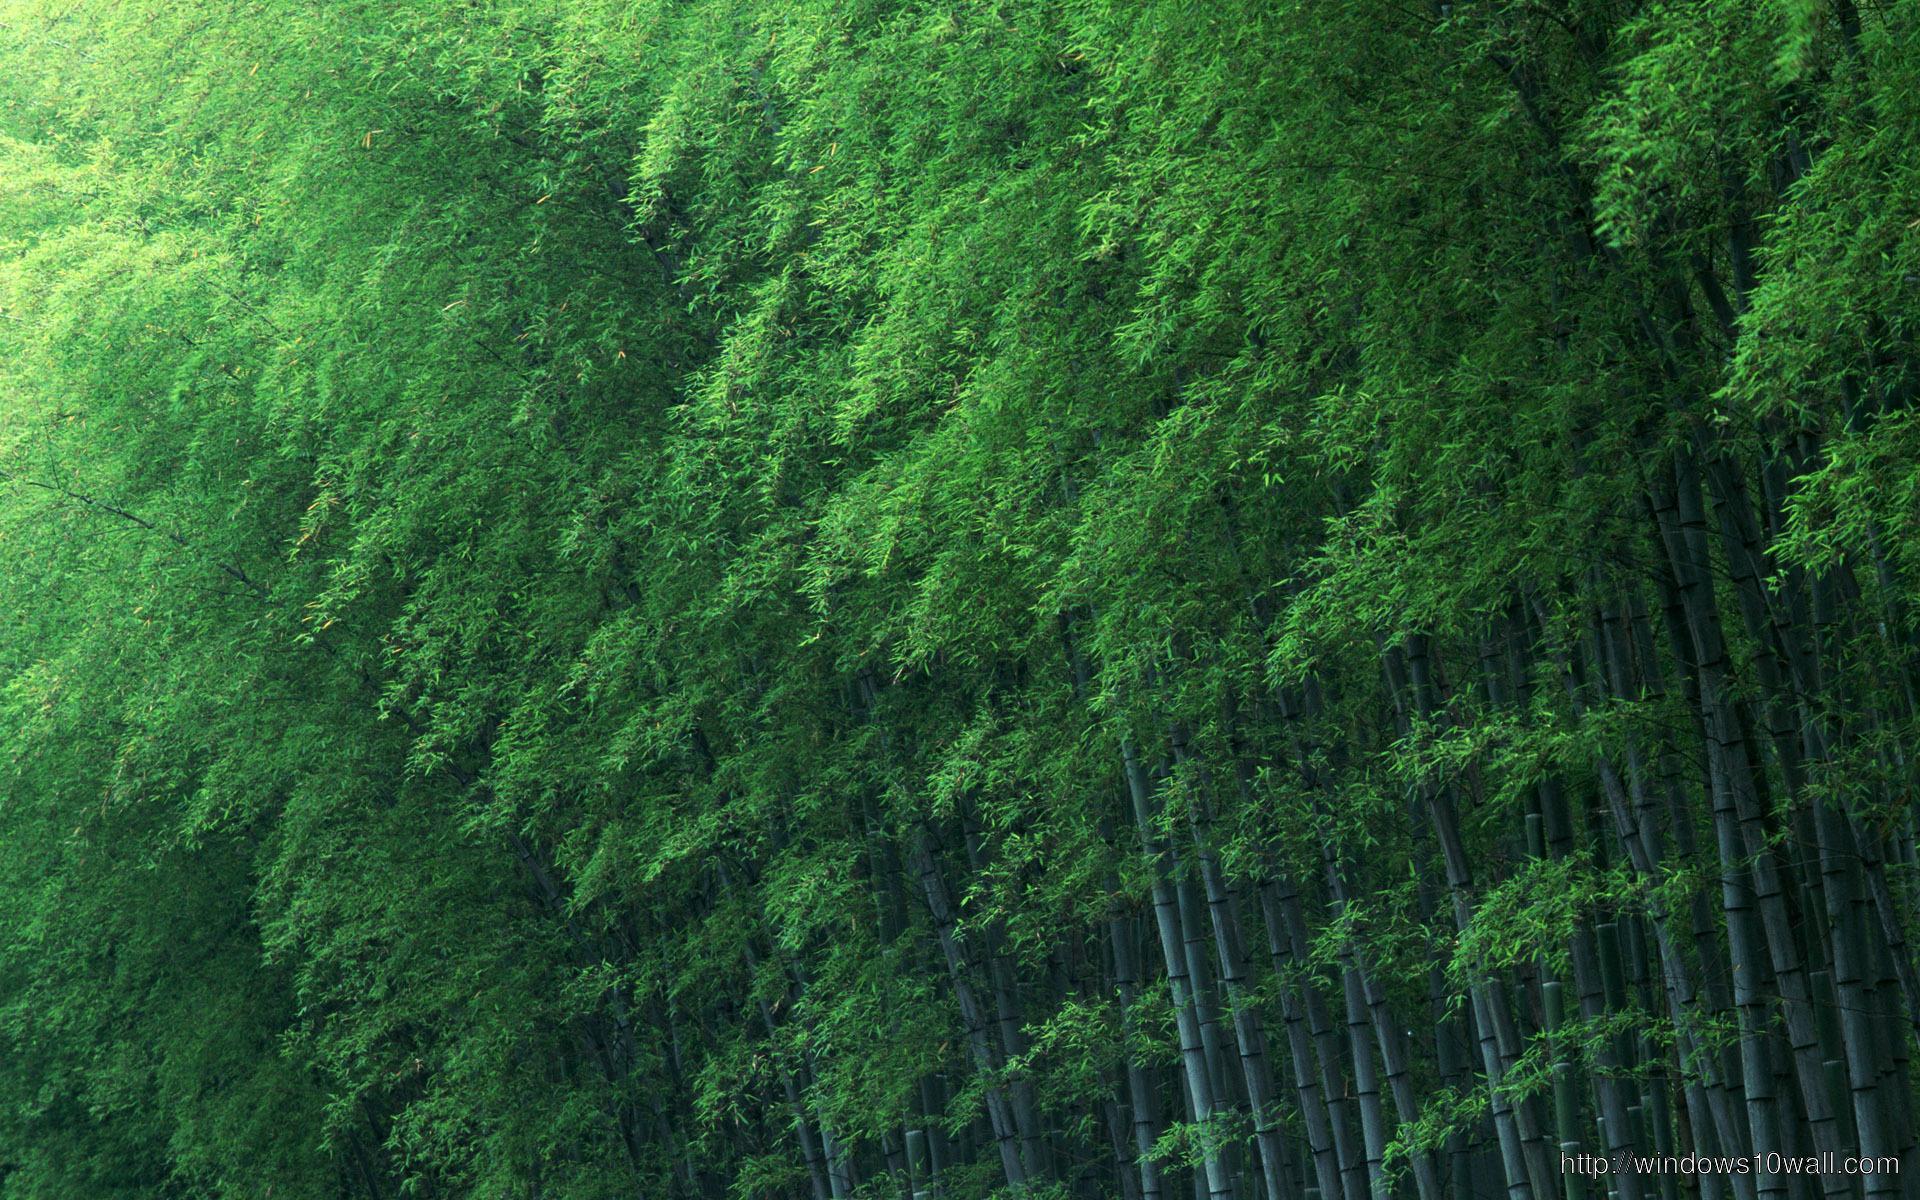 Eminem Wallpaper Iphone 5 Bamboo Forest Green Wallpaper Windows 10 Wallpapers